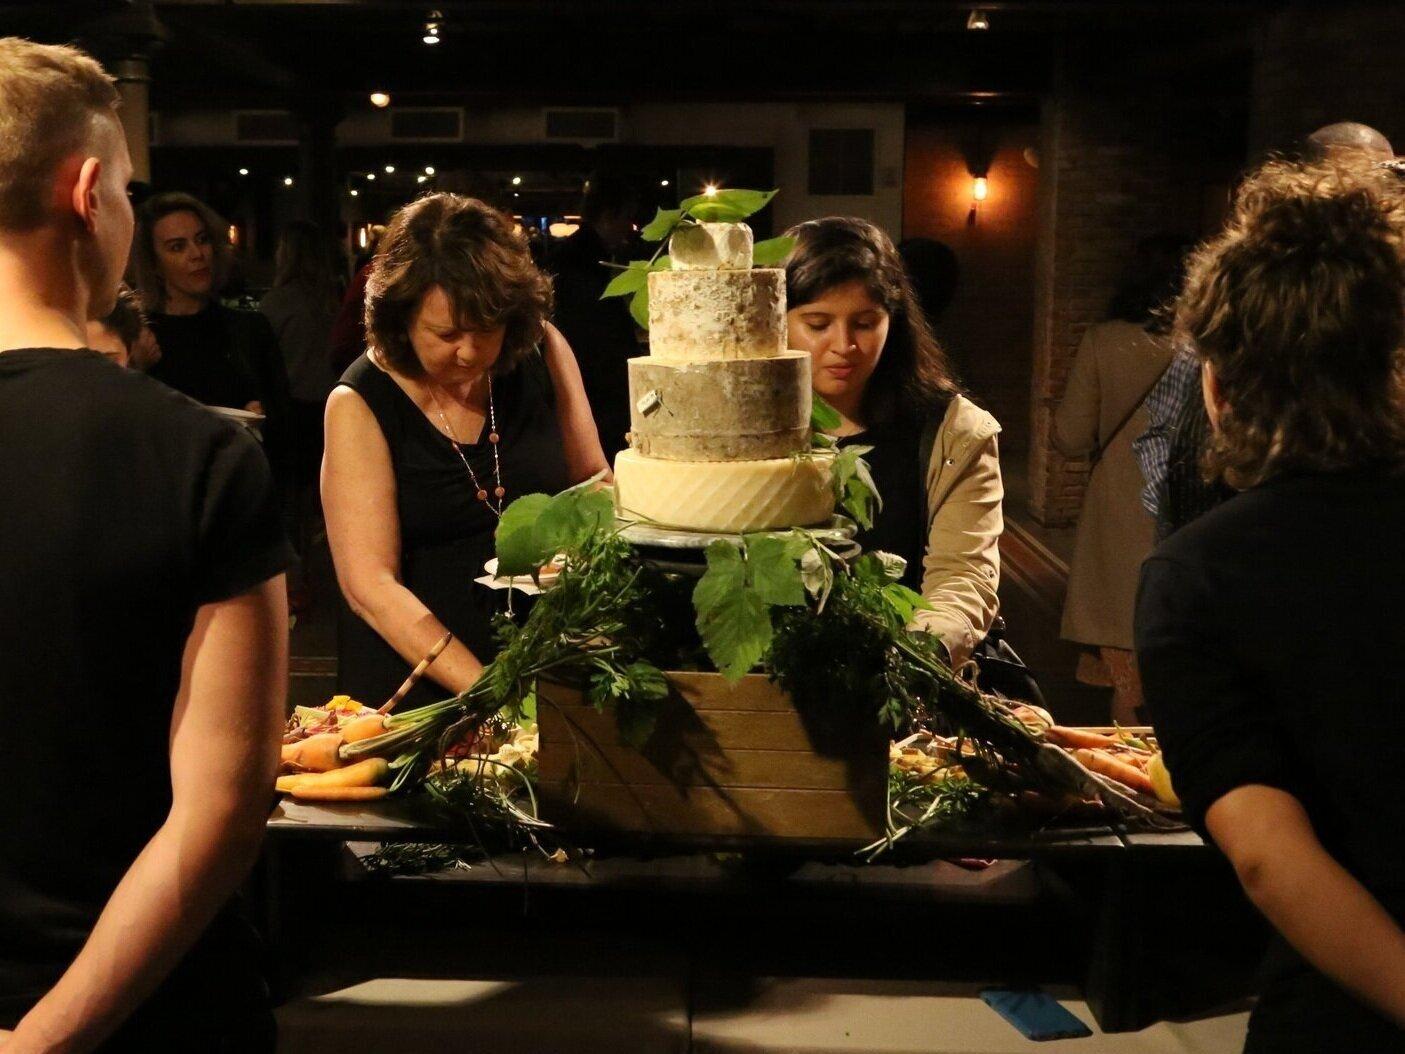 Wedding%252BCake-%252BwServers-TasteTalks%252Bcopy.jpg